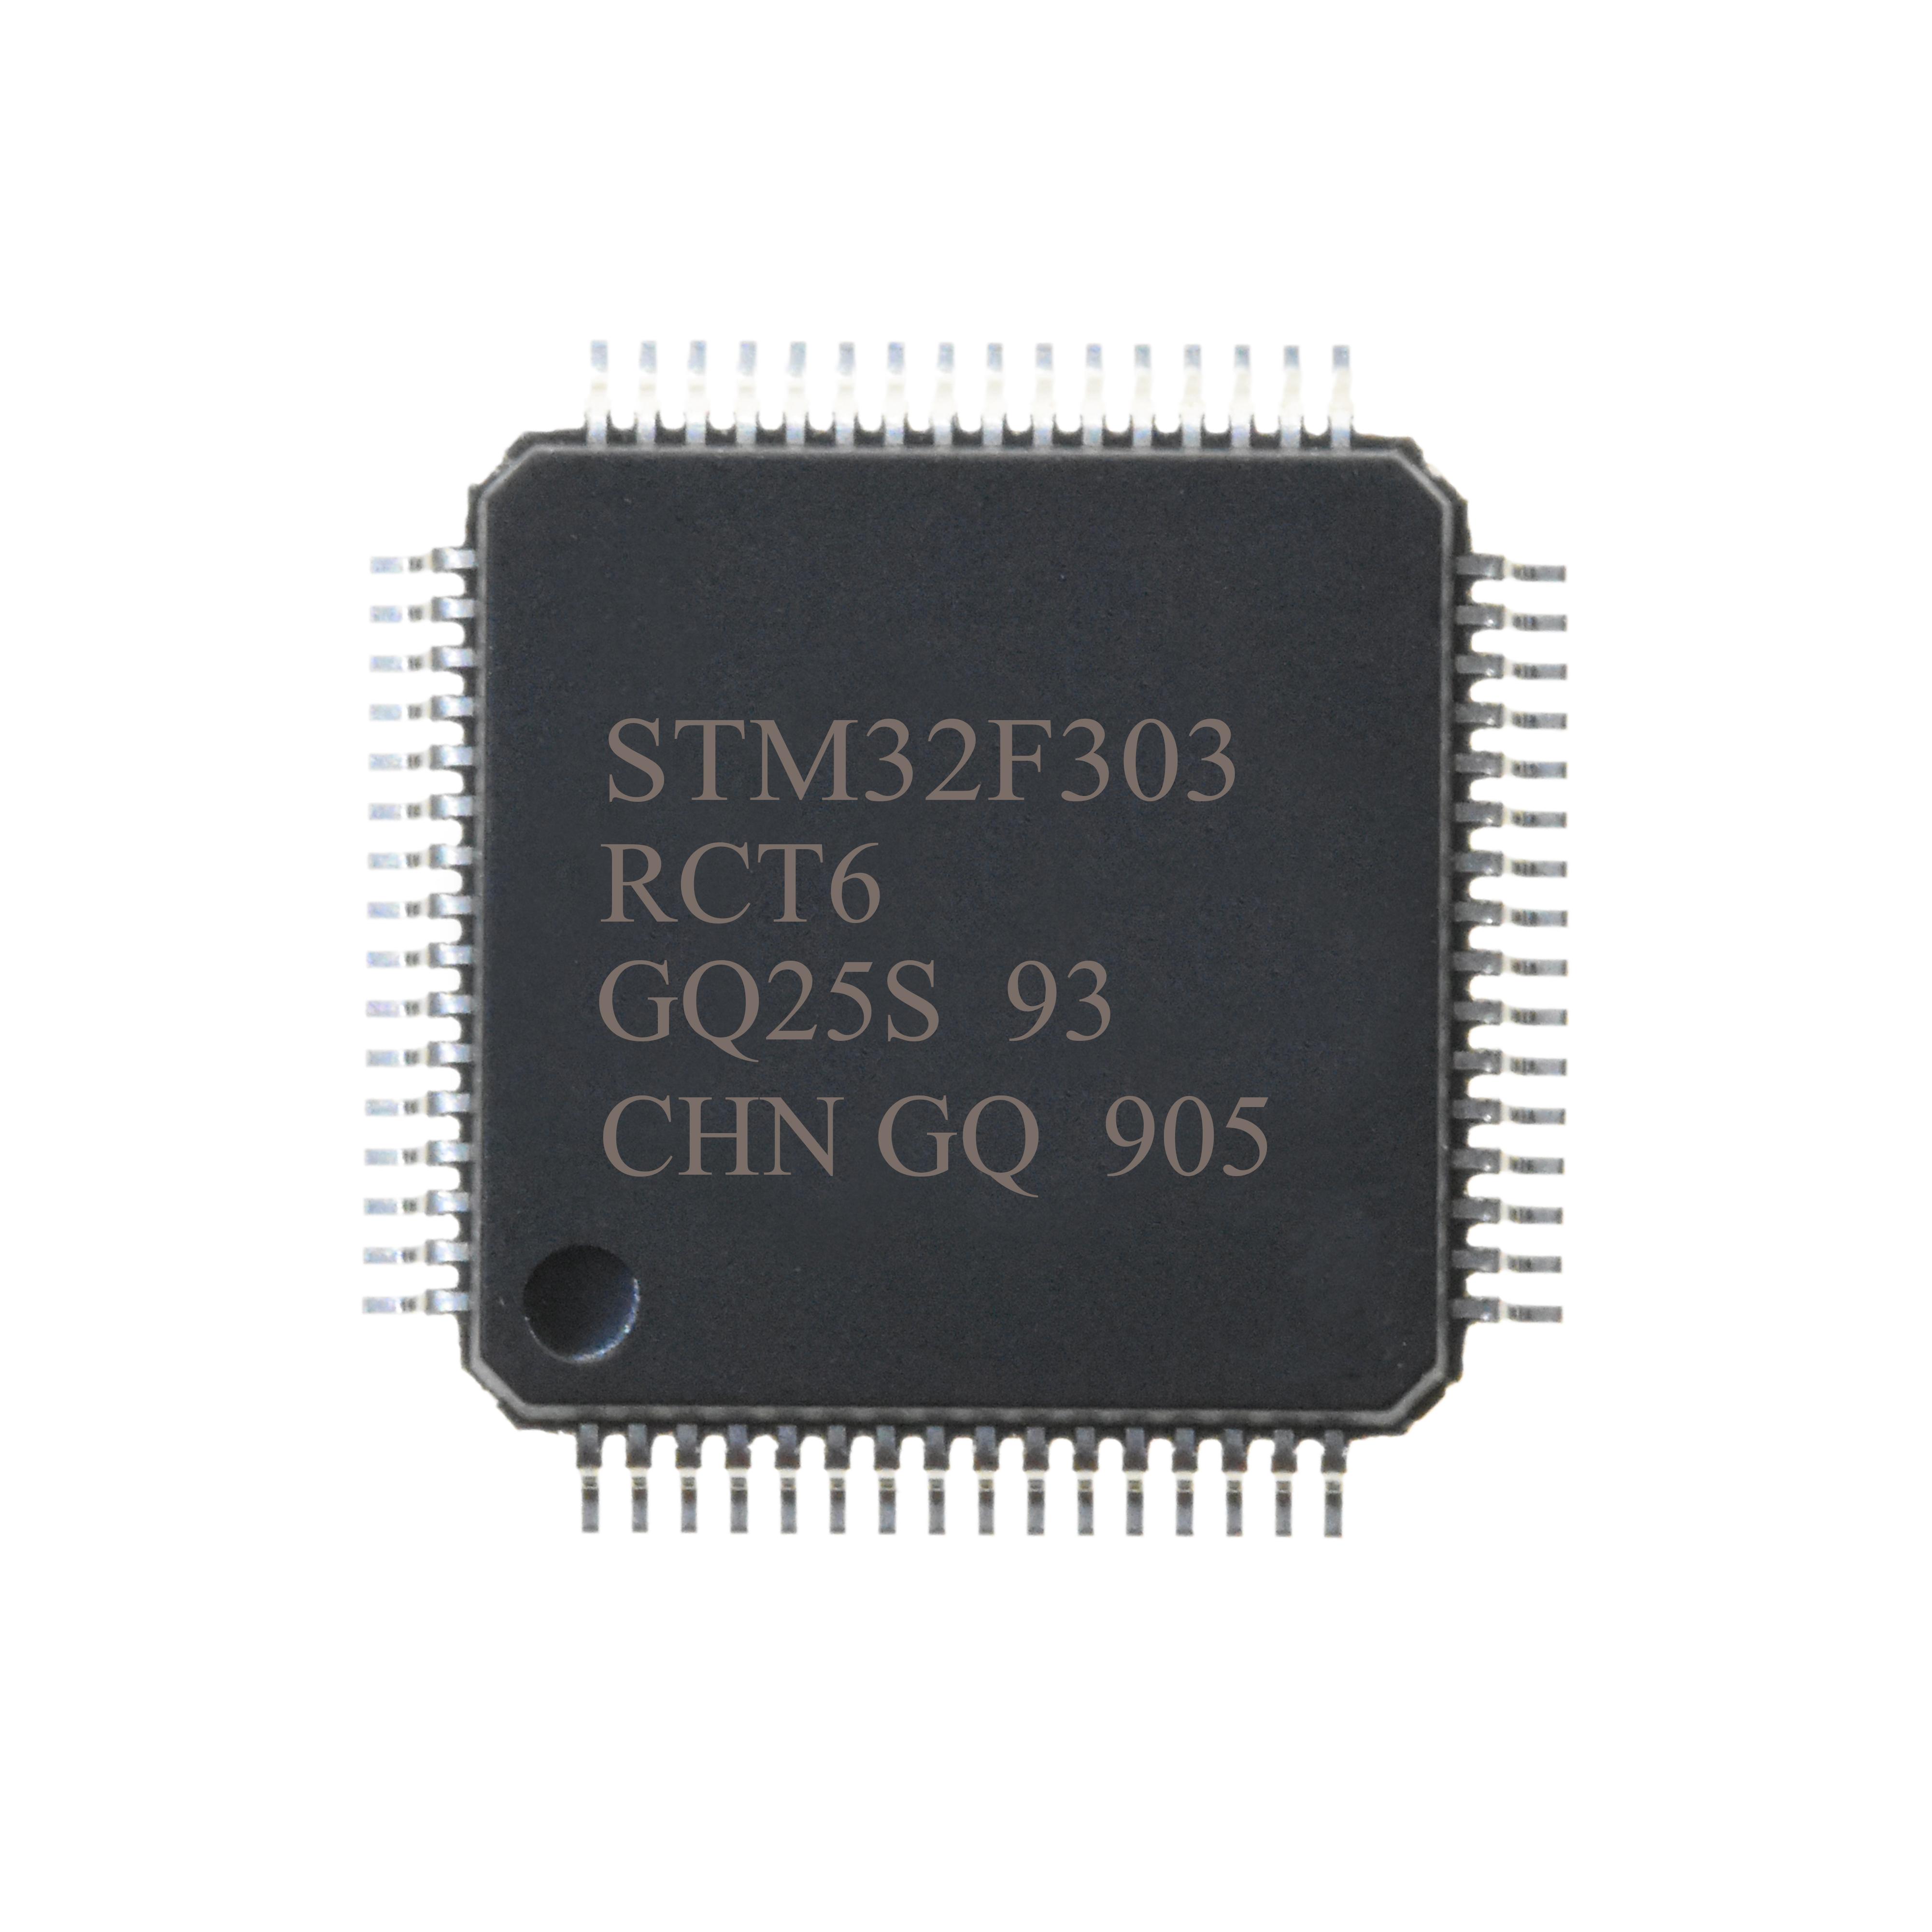 Stm32f303rct6 Mcu 32-битный Процессор Arm Cortex M4 Risc 256kb Флэш-2,5 V/3,3 V Четырёхъядерный 64-разрядный Процессор Lqfp Лоток - Buy Stm32f303rct6 Product on Alibaba.com